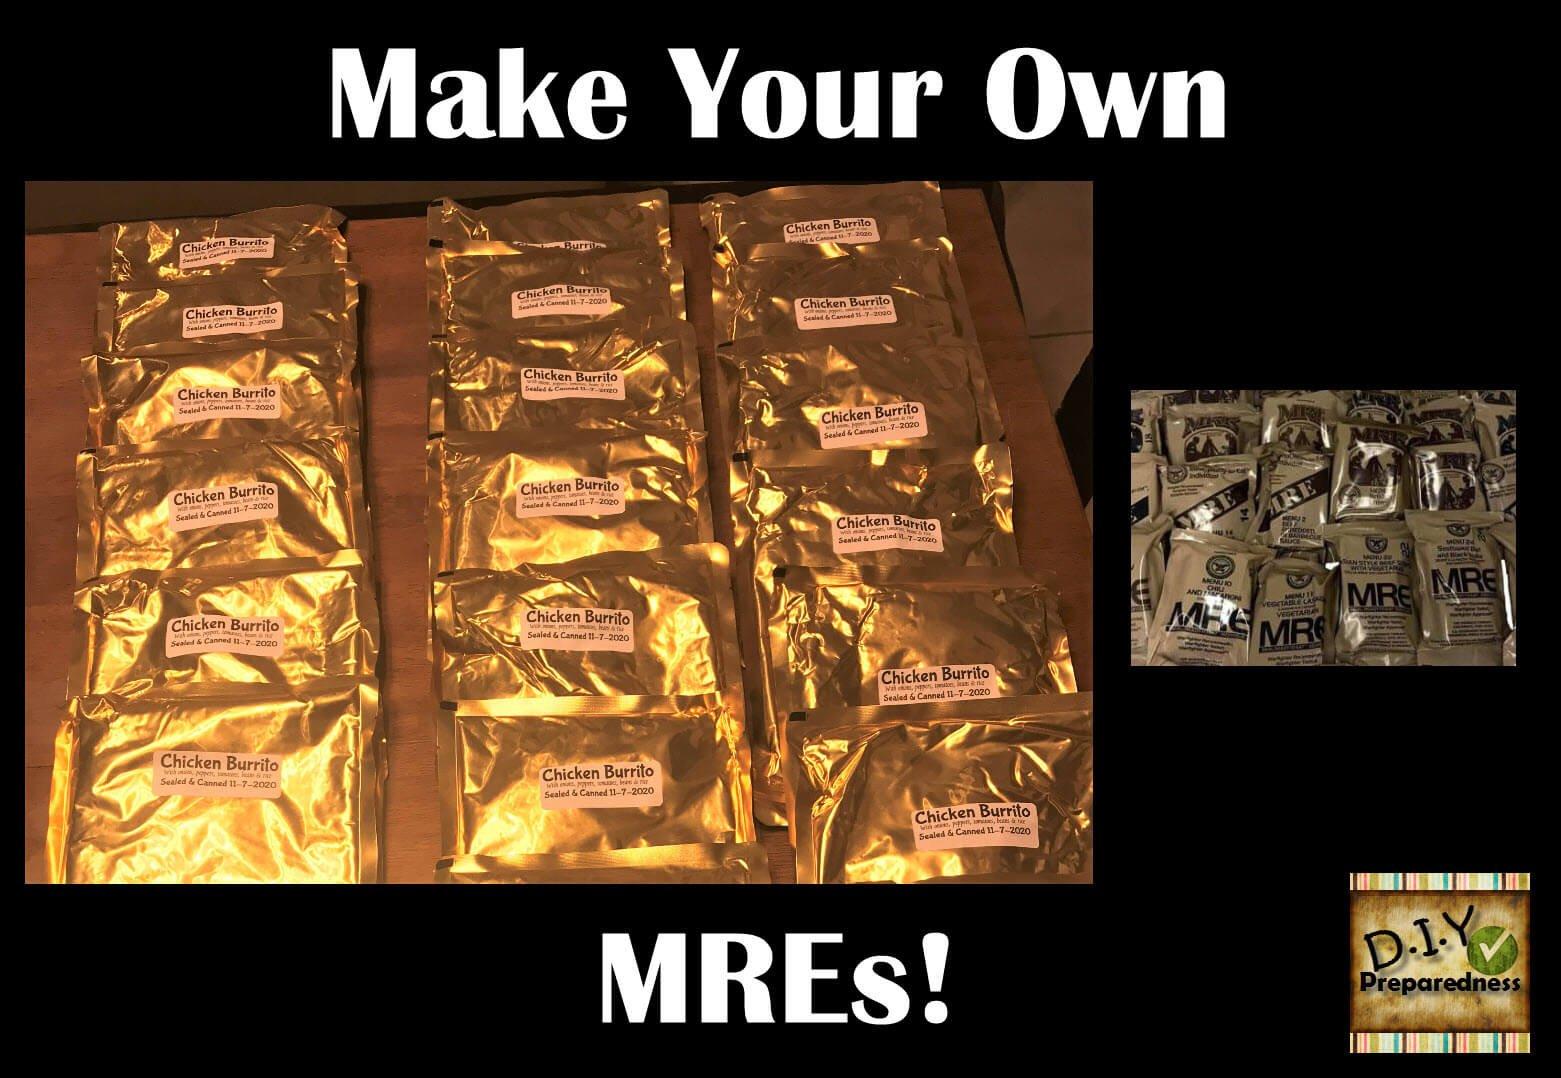 Retort Canning - Make Your Own MREs - DIY Preparedness